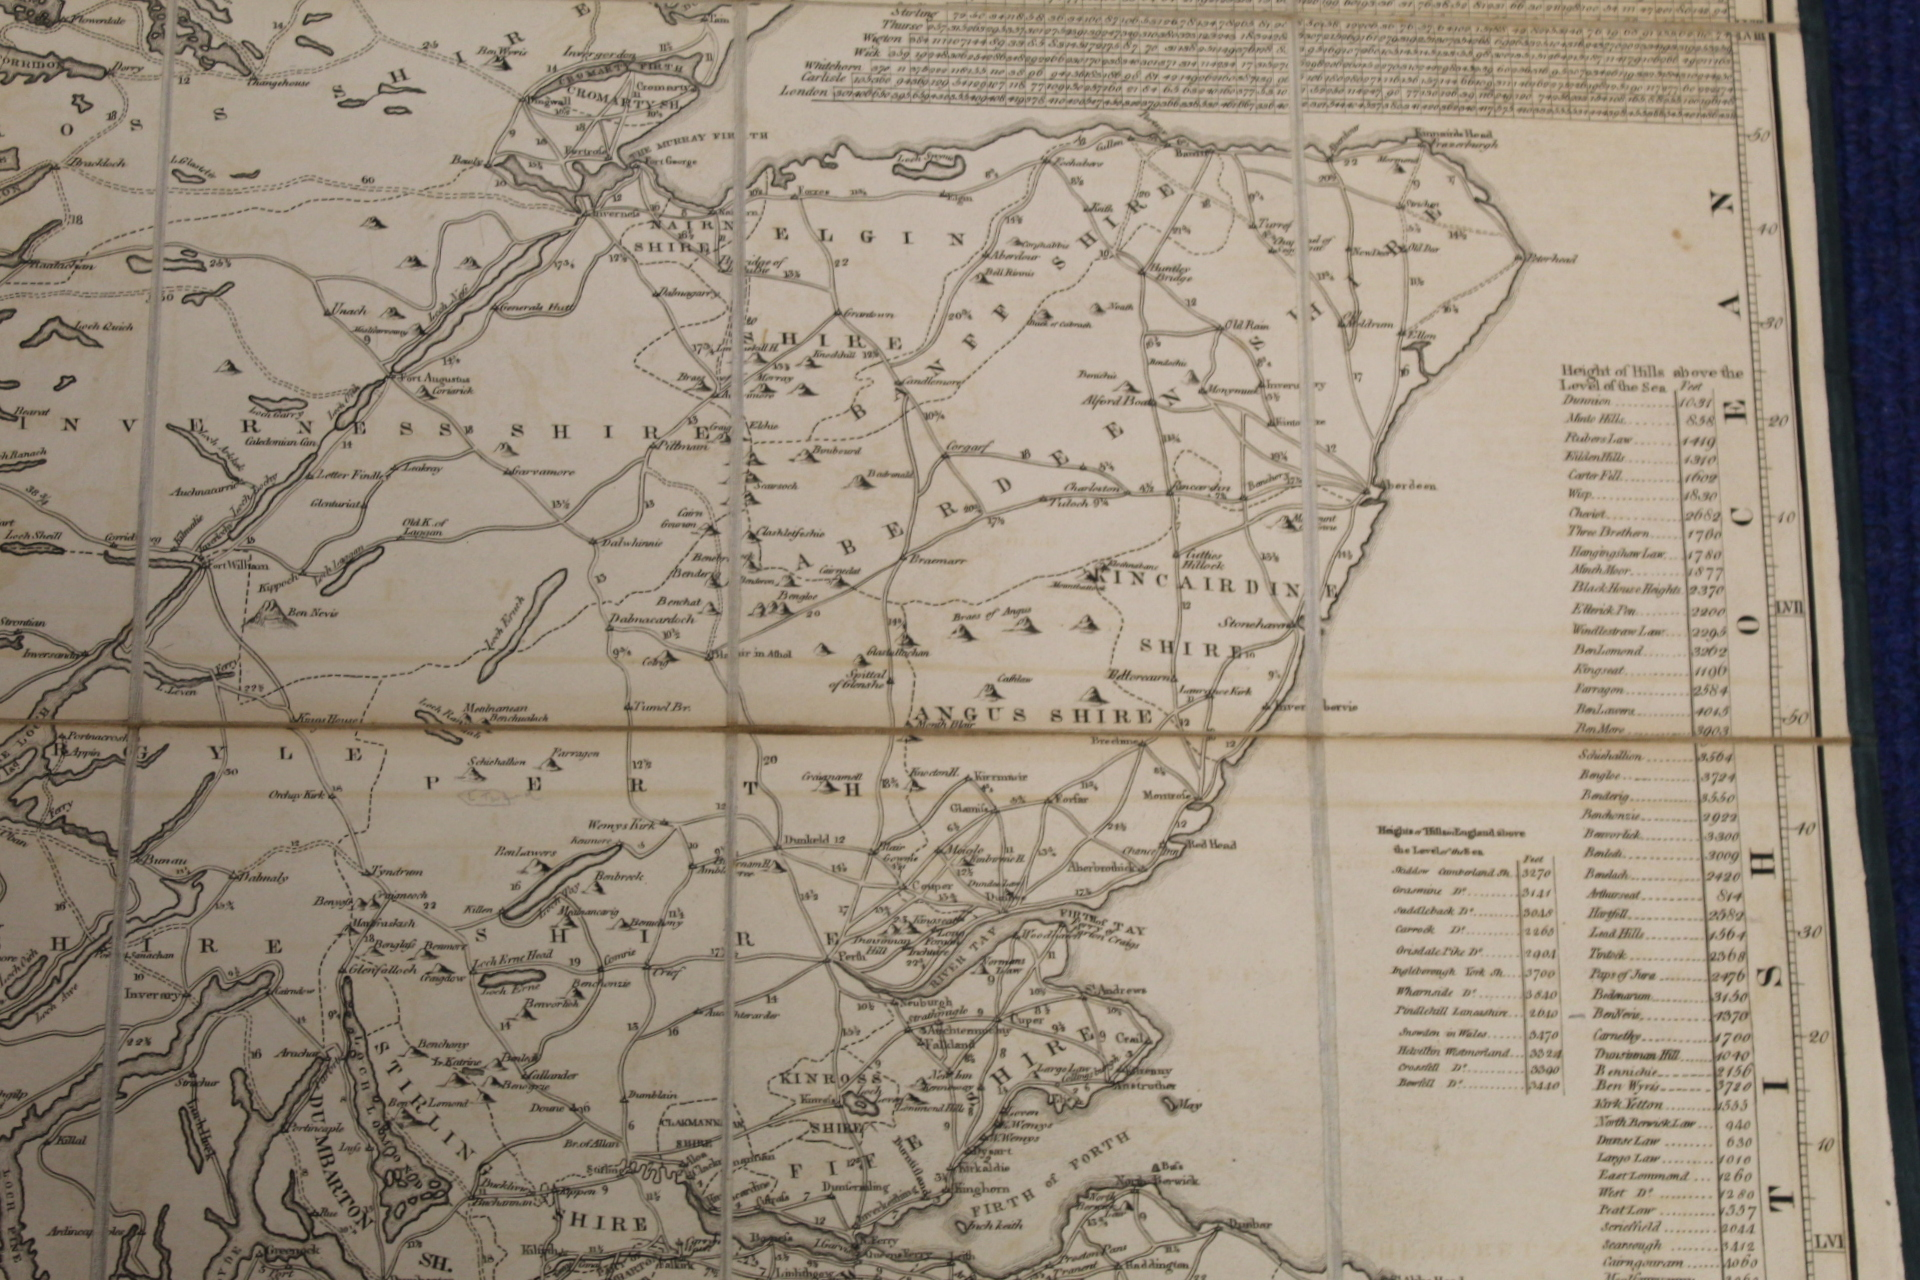 KIRKWOOD J. & SONS.Map of Scotland. Hand col. eng. fldg. linen map in well worn orig. slip case. - Image 30 of 36